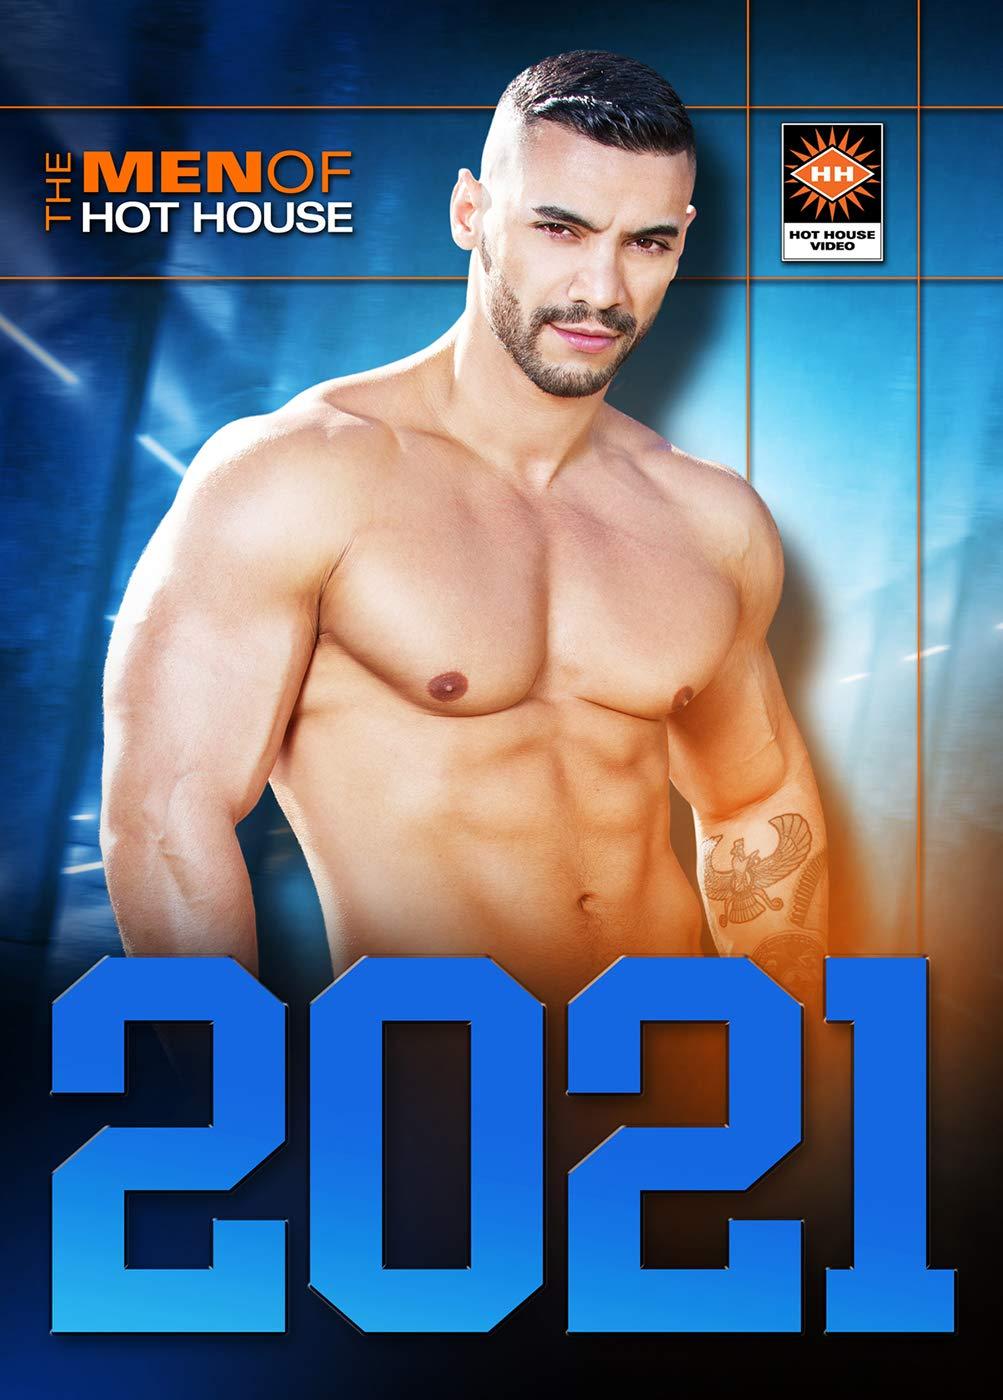 2021 House Calendar Amazon.com: The Men of Hot House 2021 (Calendars 2021